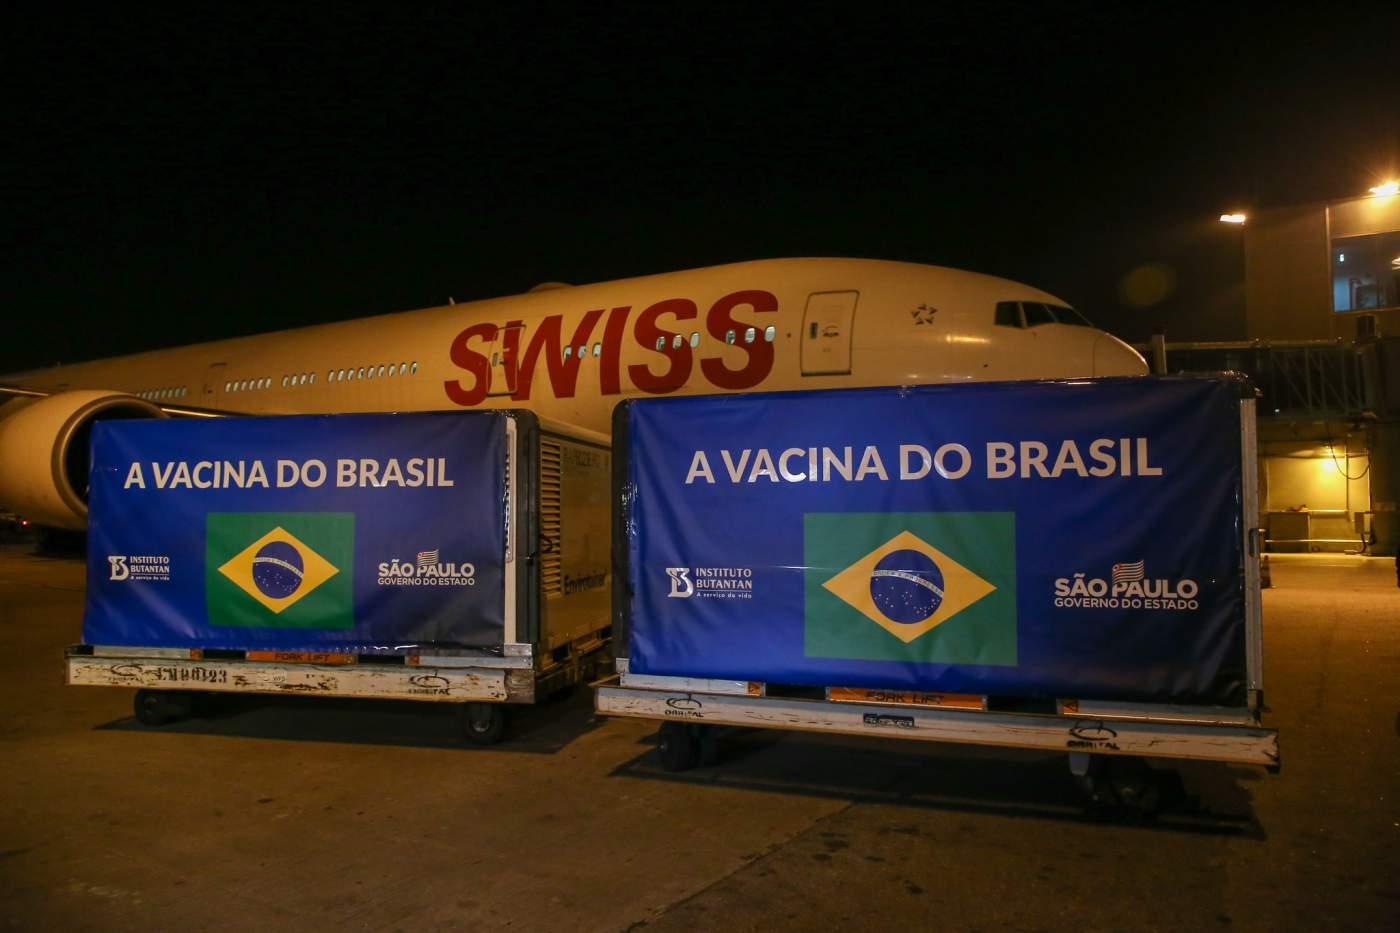 Vacinas Aeroporto de São Paulo